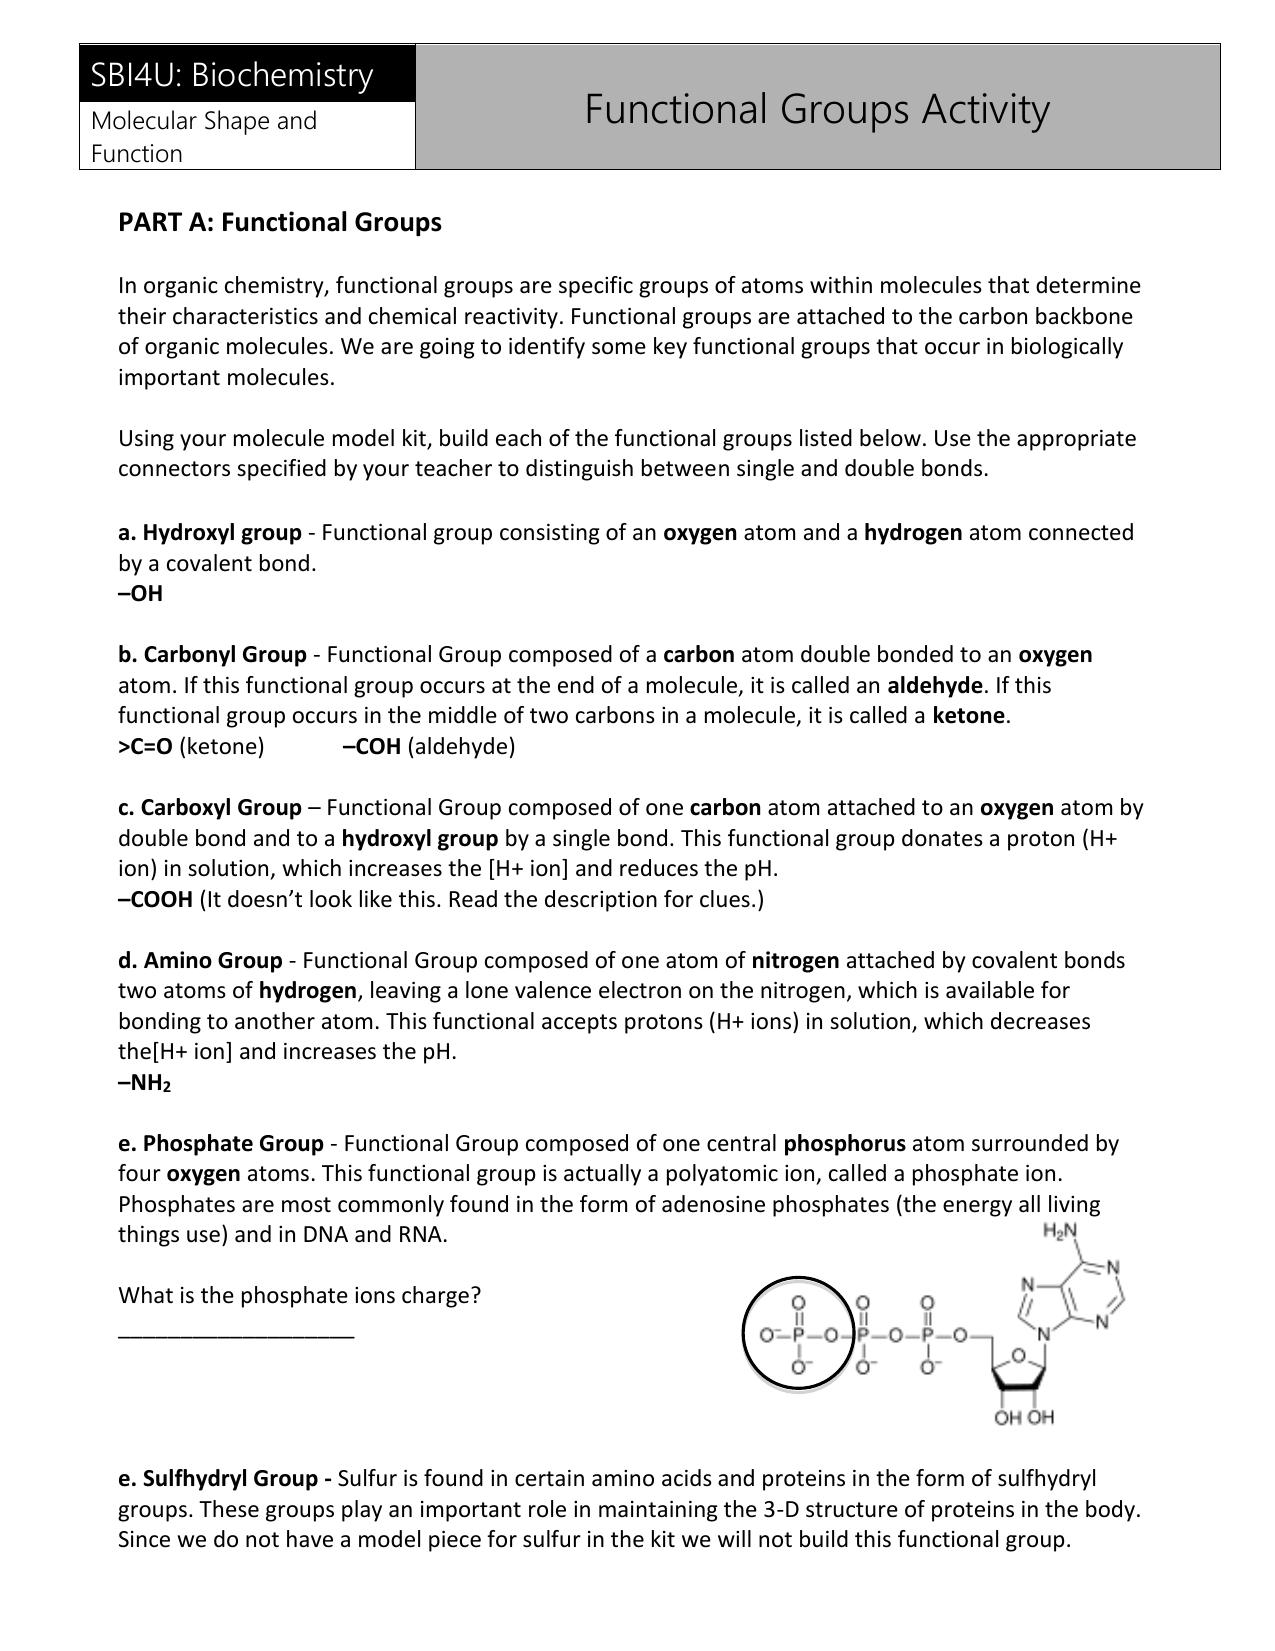 SBI4U: Biochemistry Functional Groups Activity Molecular Shape